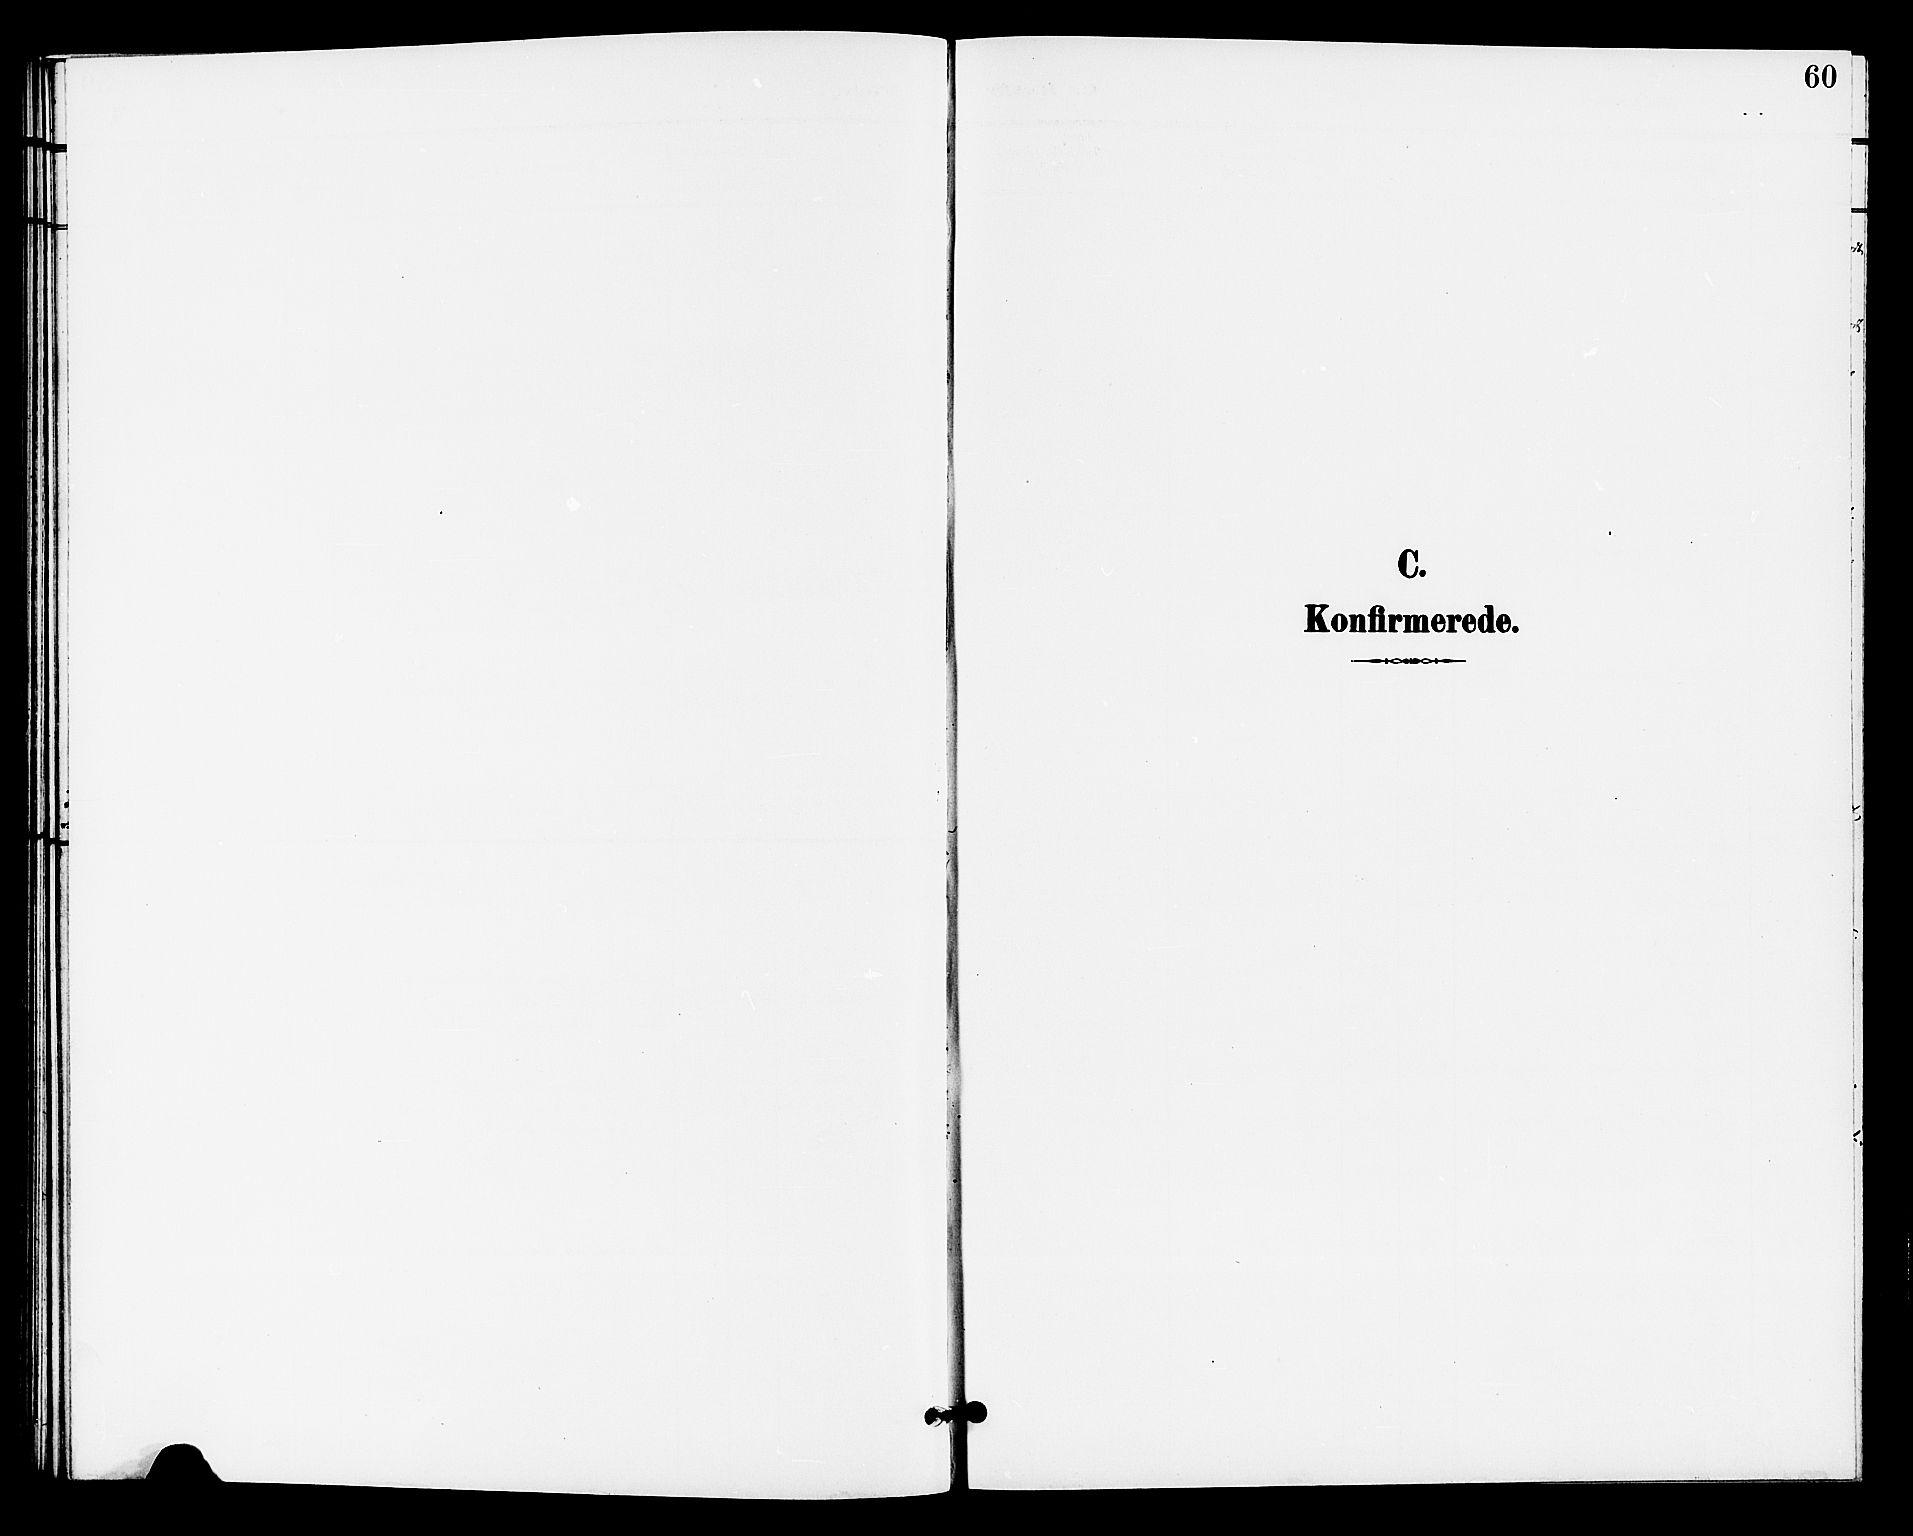 SAKO, Bø kirkebøker, G/Ga/L0006: Klokkerbok nr. 6, 1898-1909, s. 60